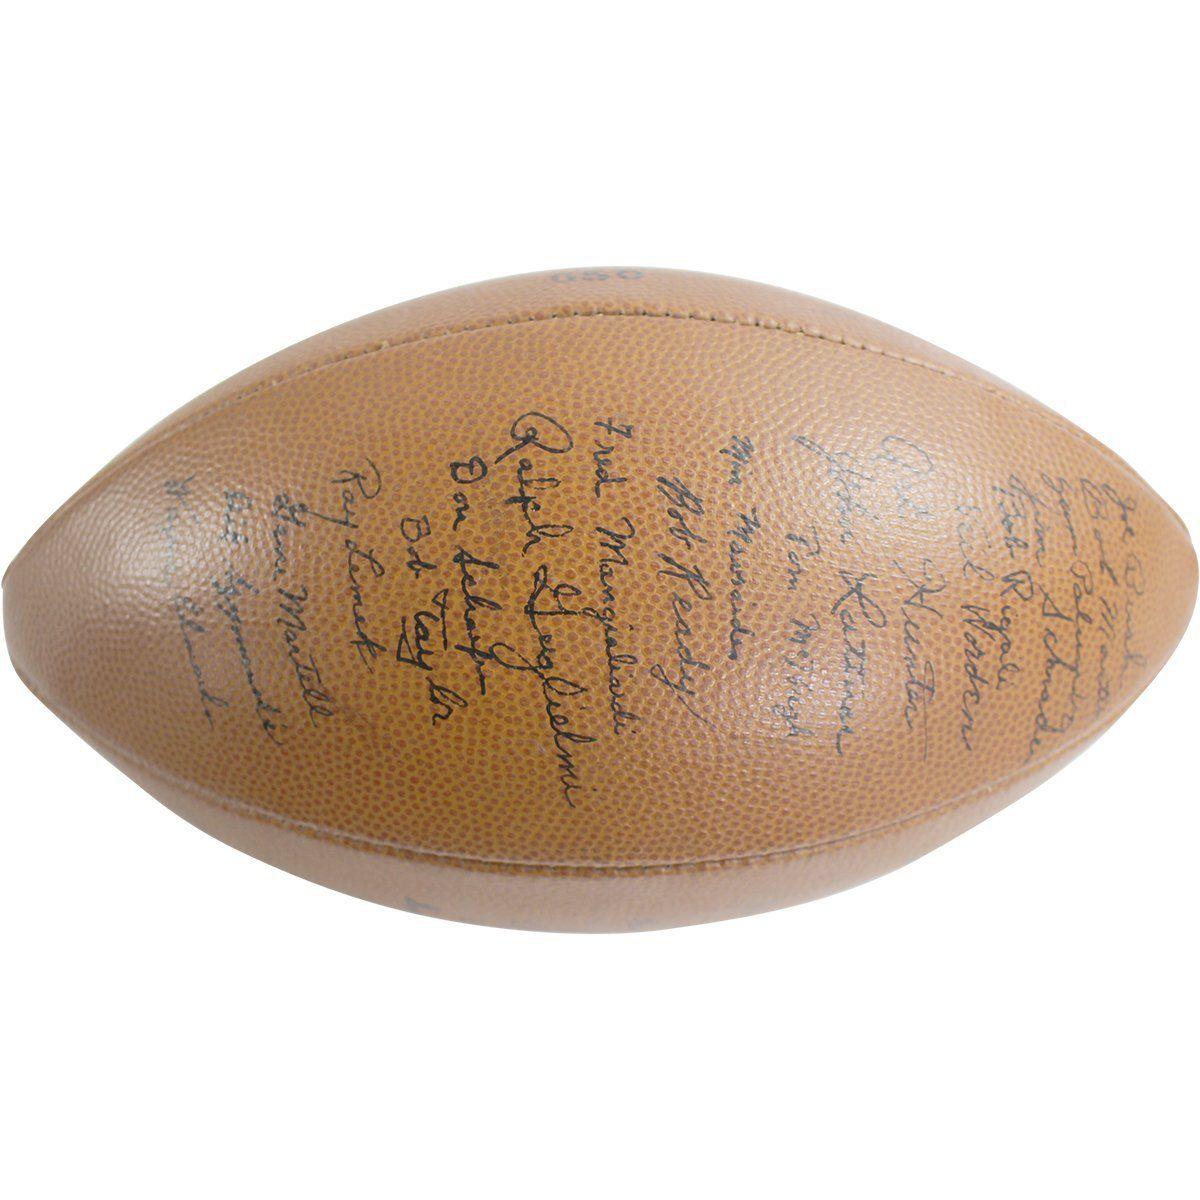 1953 Notre Dame Football Team Signed 35 Sig Football JSA